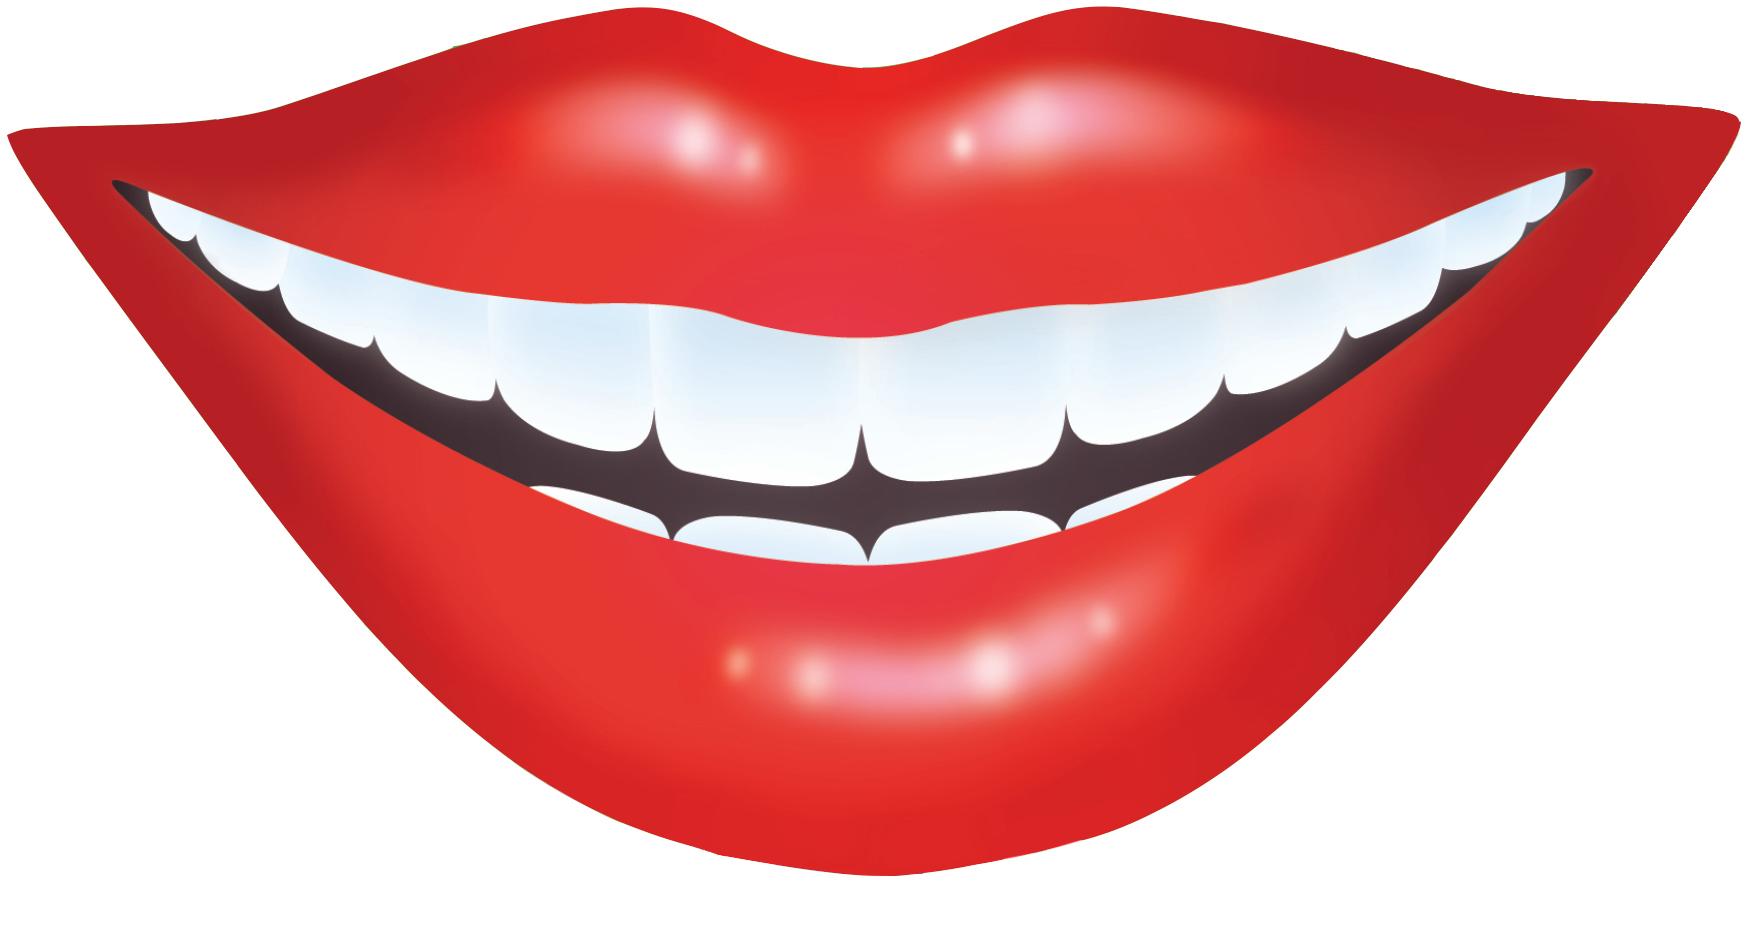 cartoon-lips-clip-art-14103